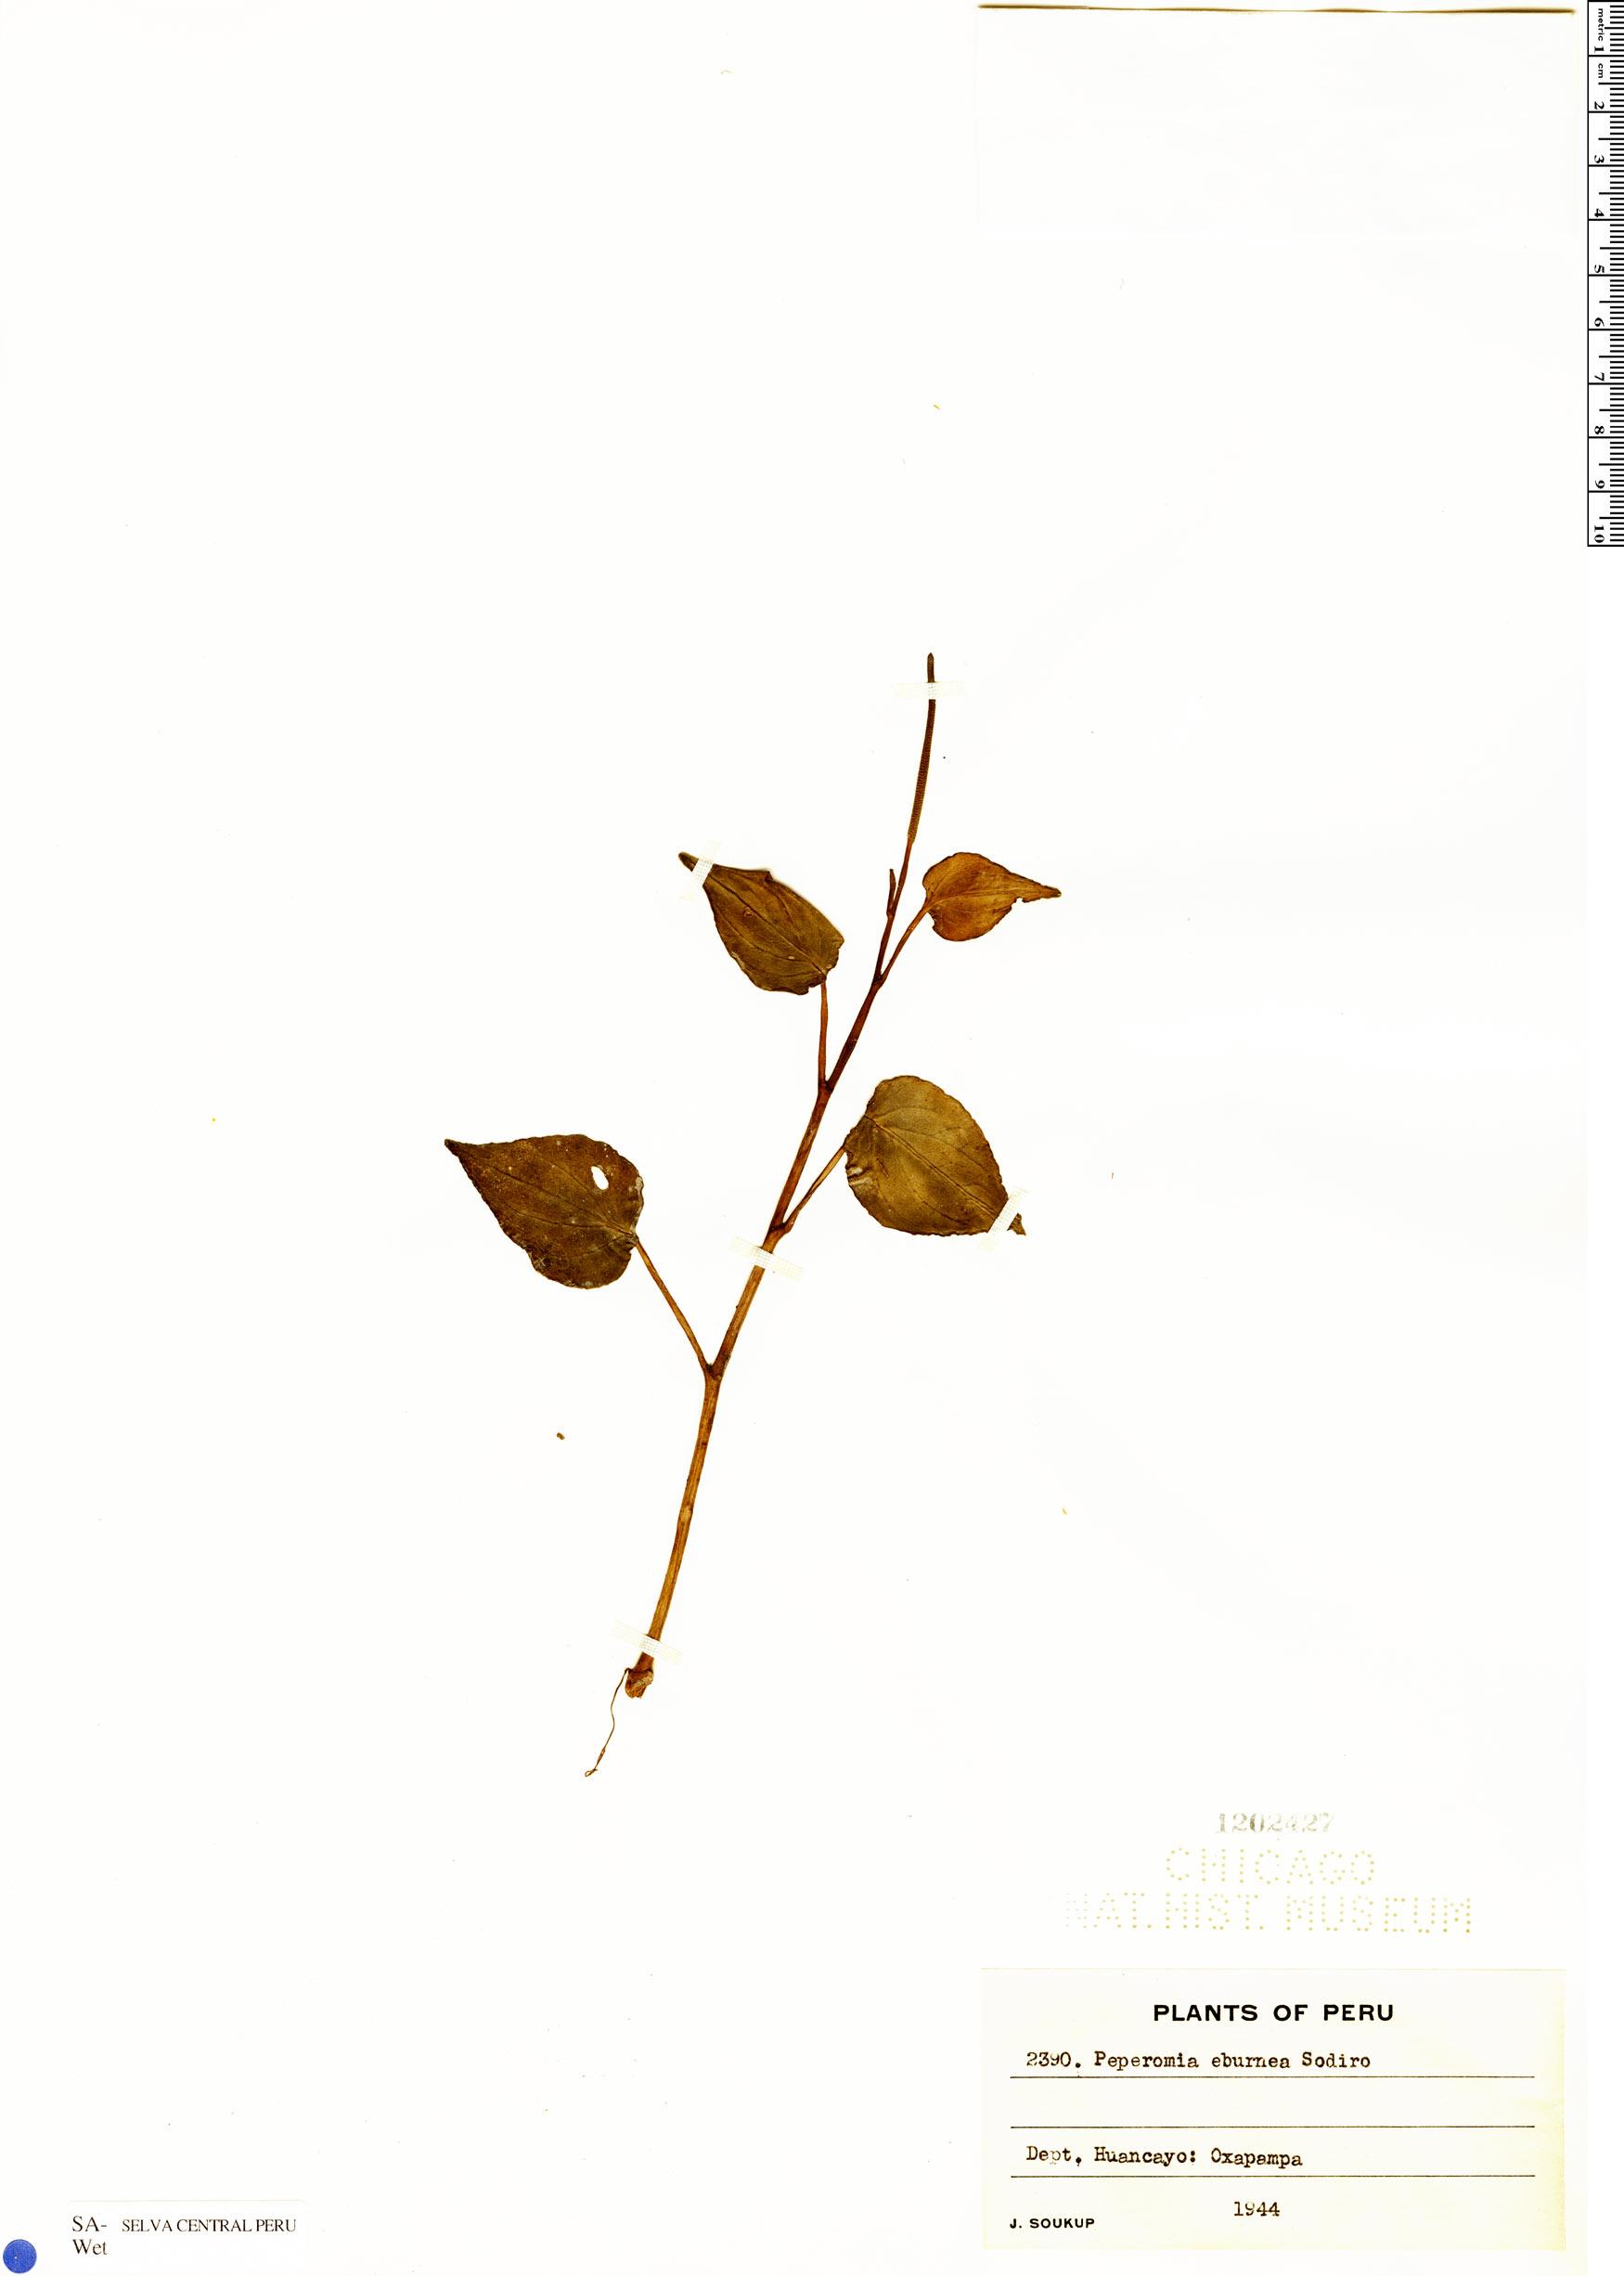 Specimen: Peperomia eburnea